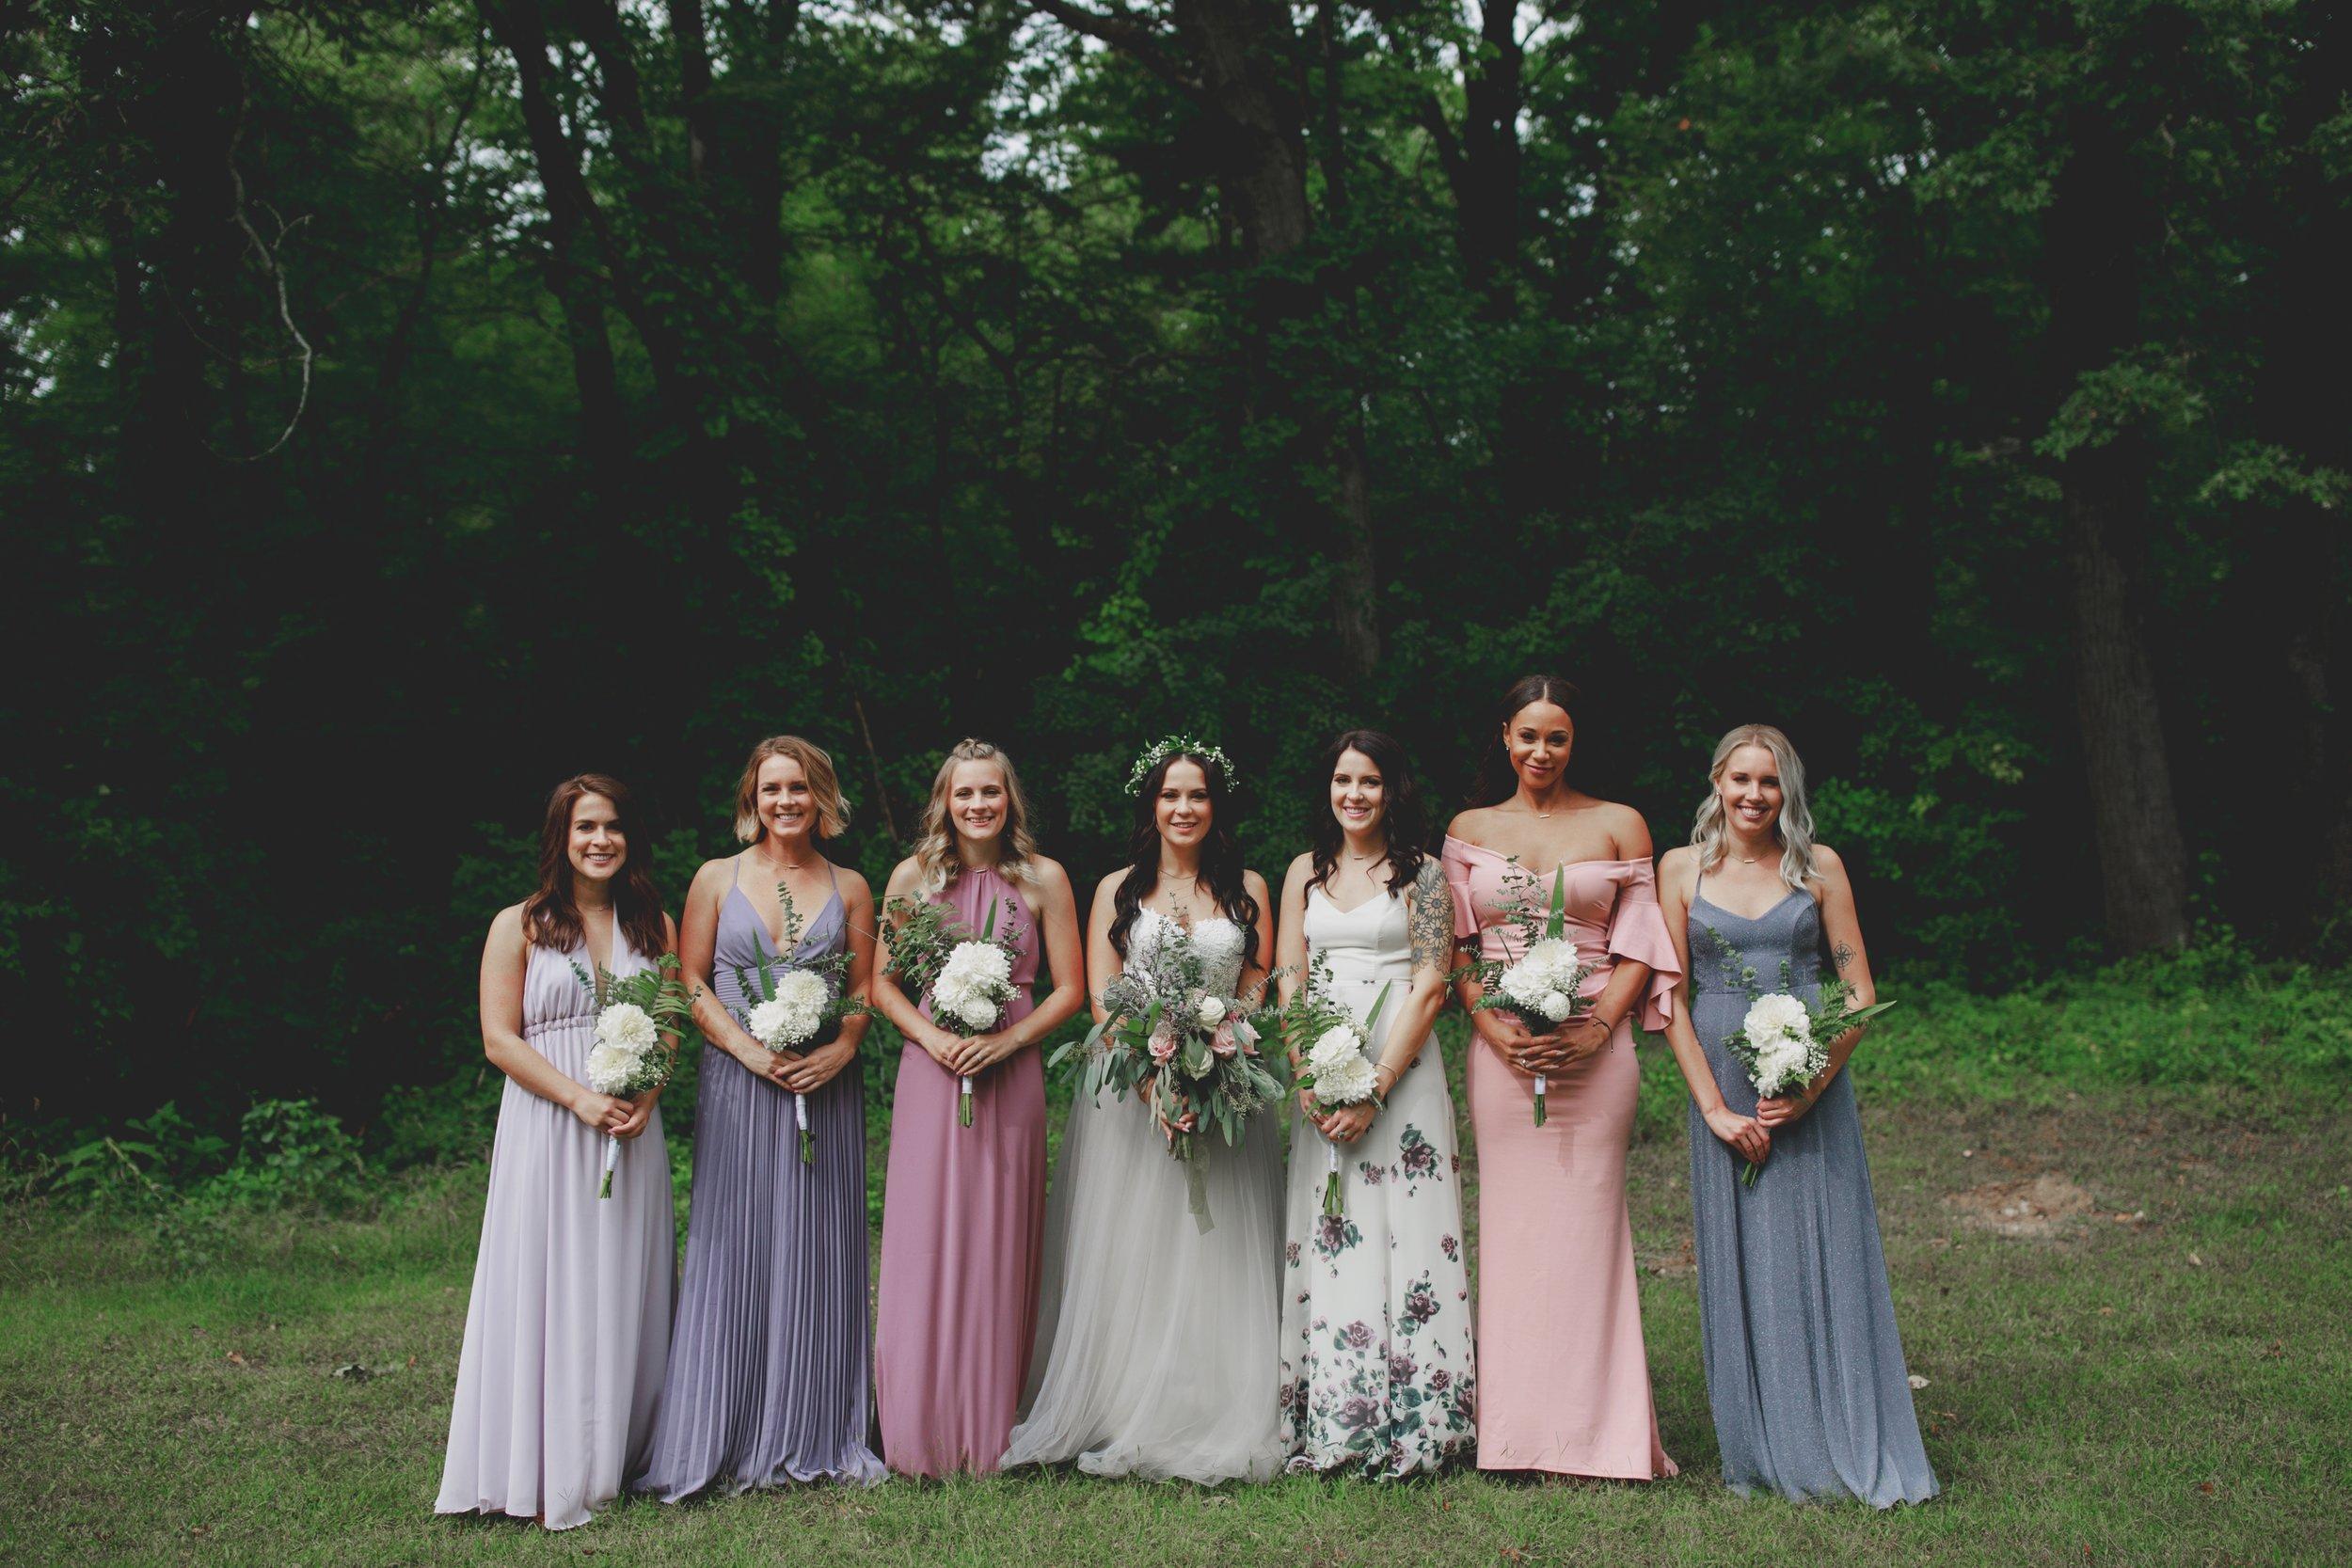 amanda_vanvels_michigan_camp_wedding_059.jpg